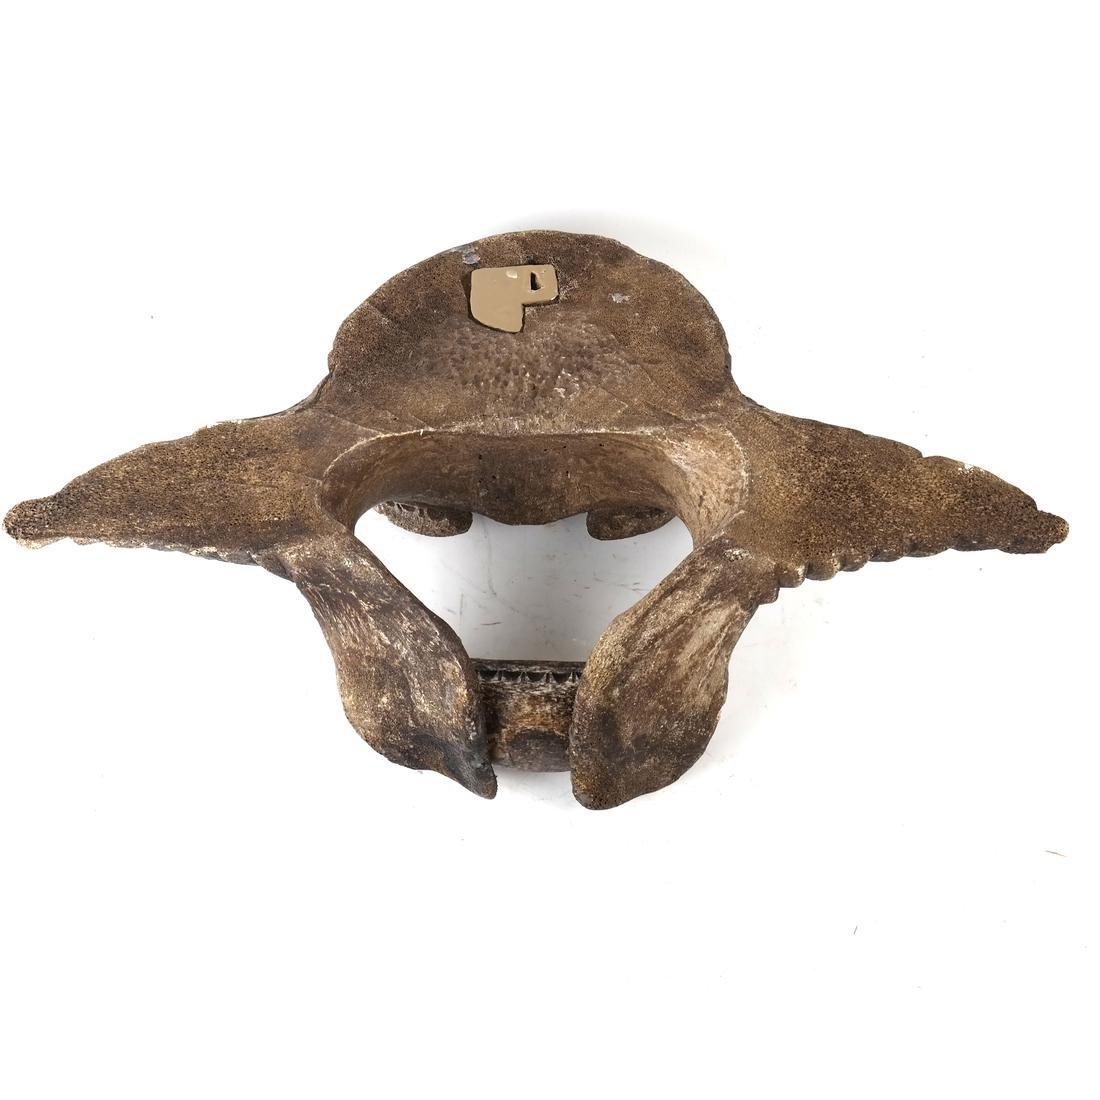 Inuit Whale bone Sculpture - 6